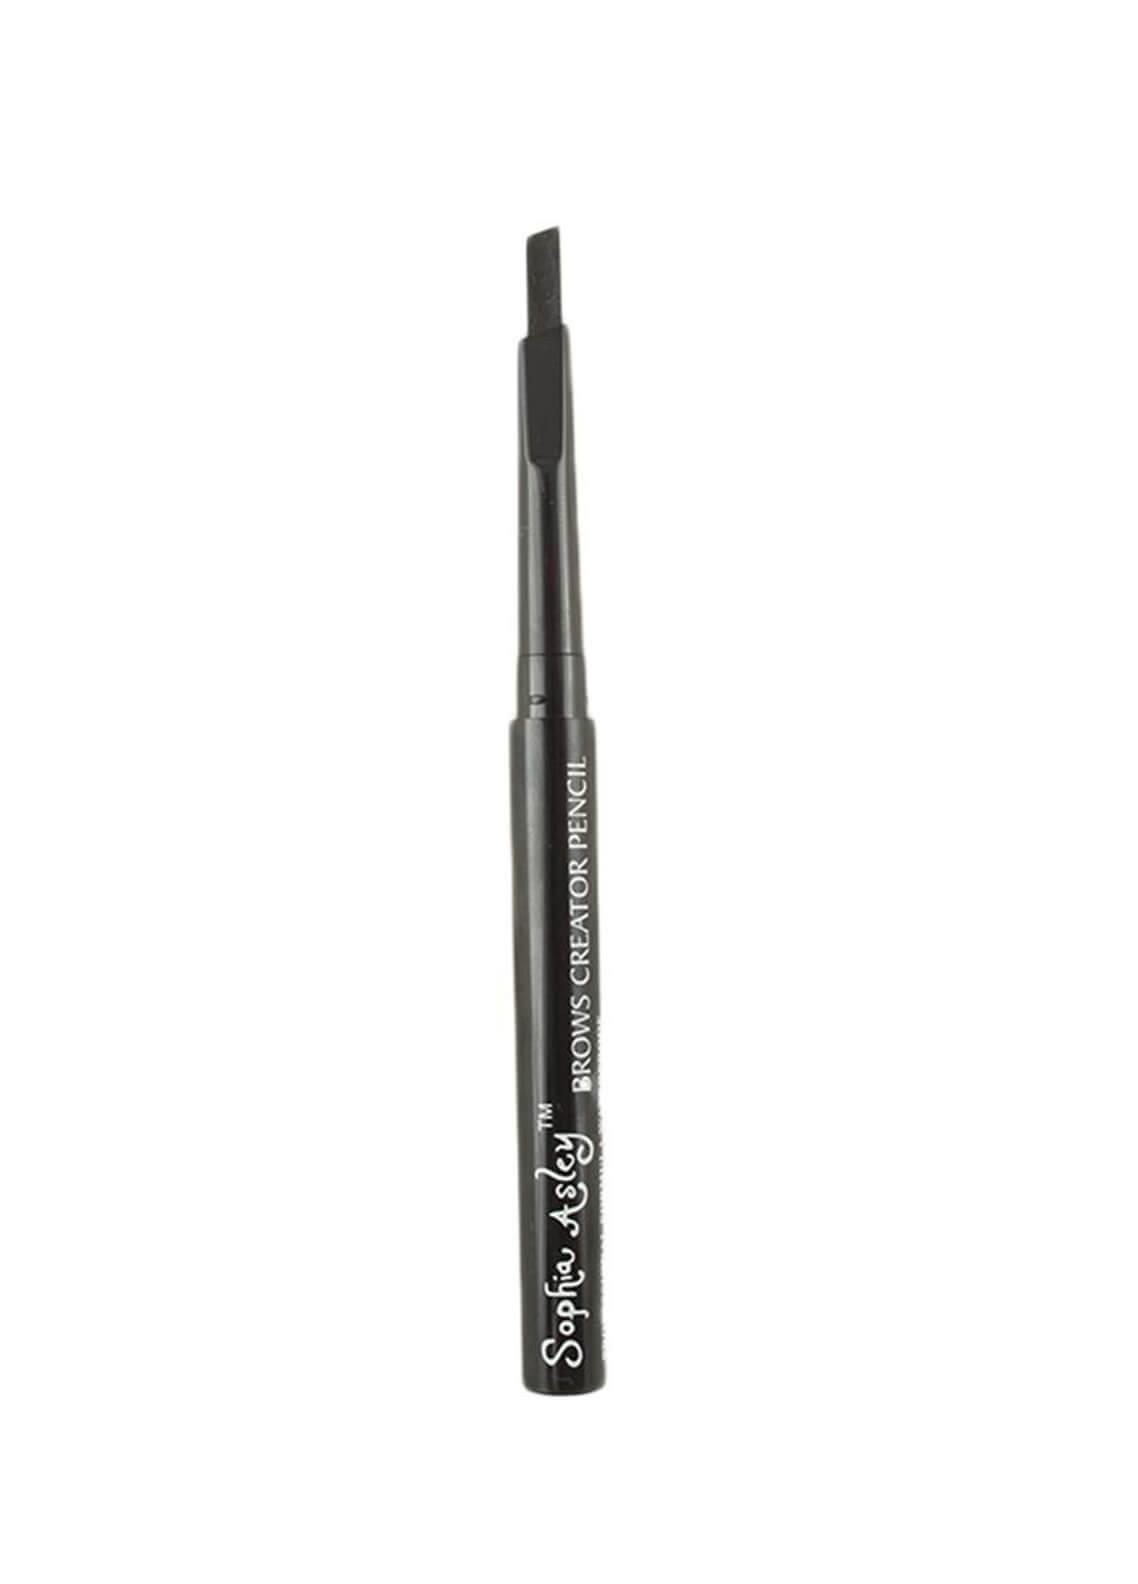 Sophia Asley Brow Creator Professional Waterproof Pencil - Black